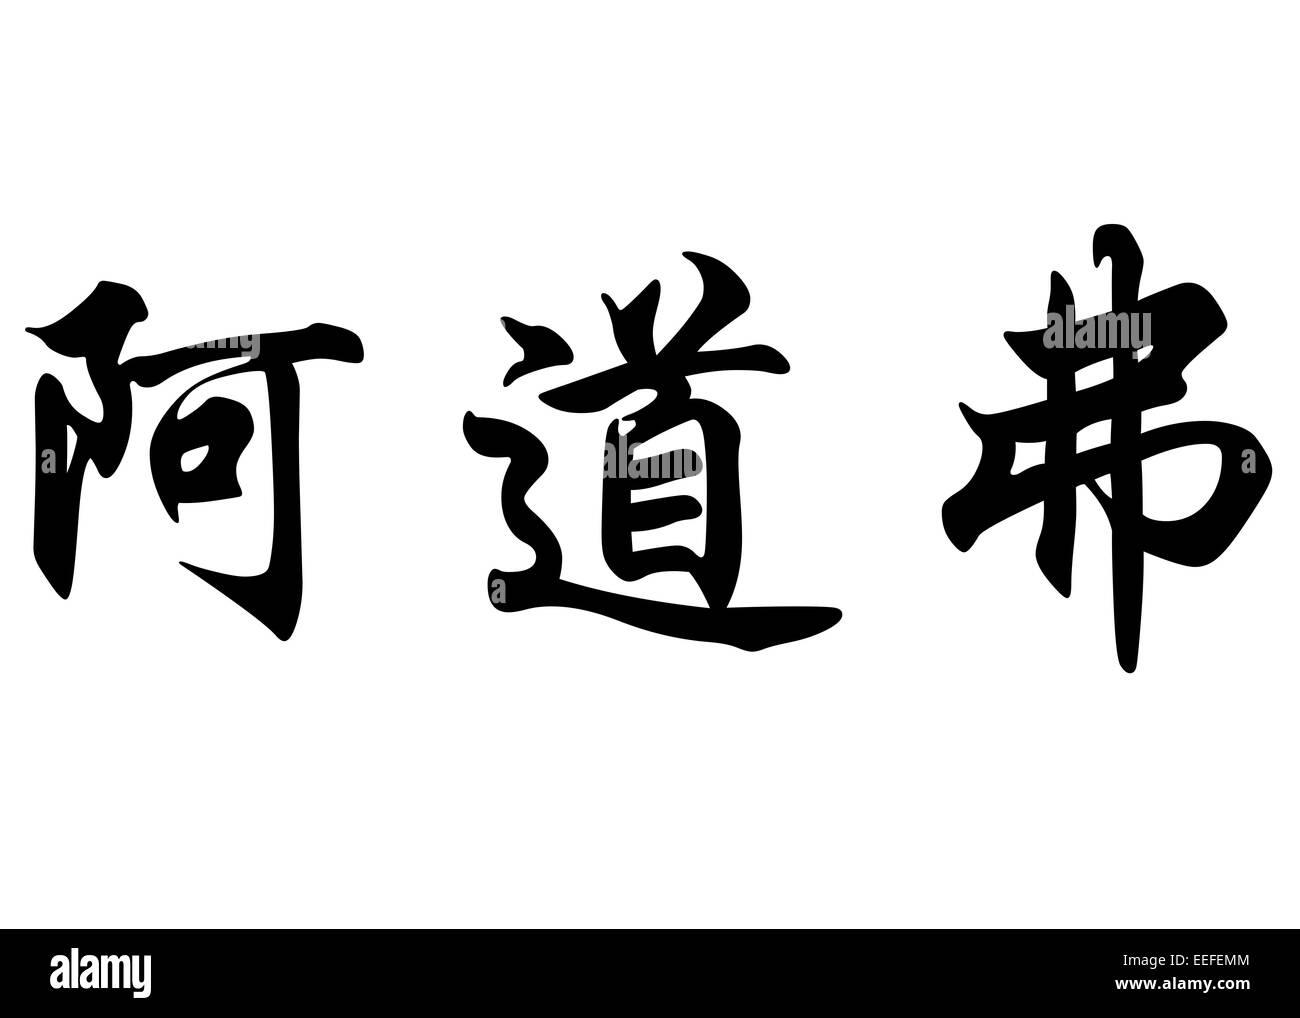 English name adolfo in chinese kanji calligraphy characters or stock english name adolfo in chinese kanji calligraphy characters or japanese characters biocorpaavc Choice Image